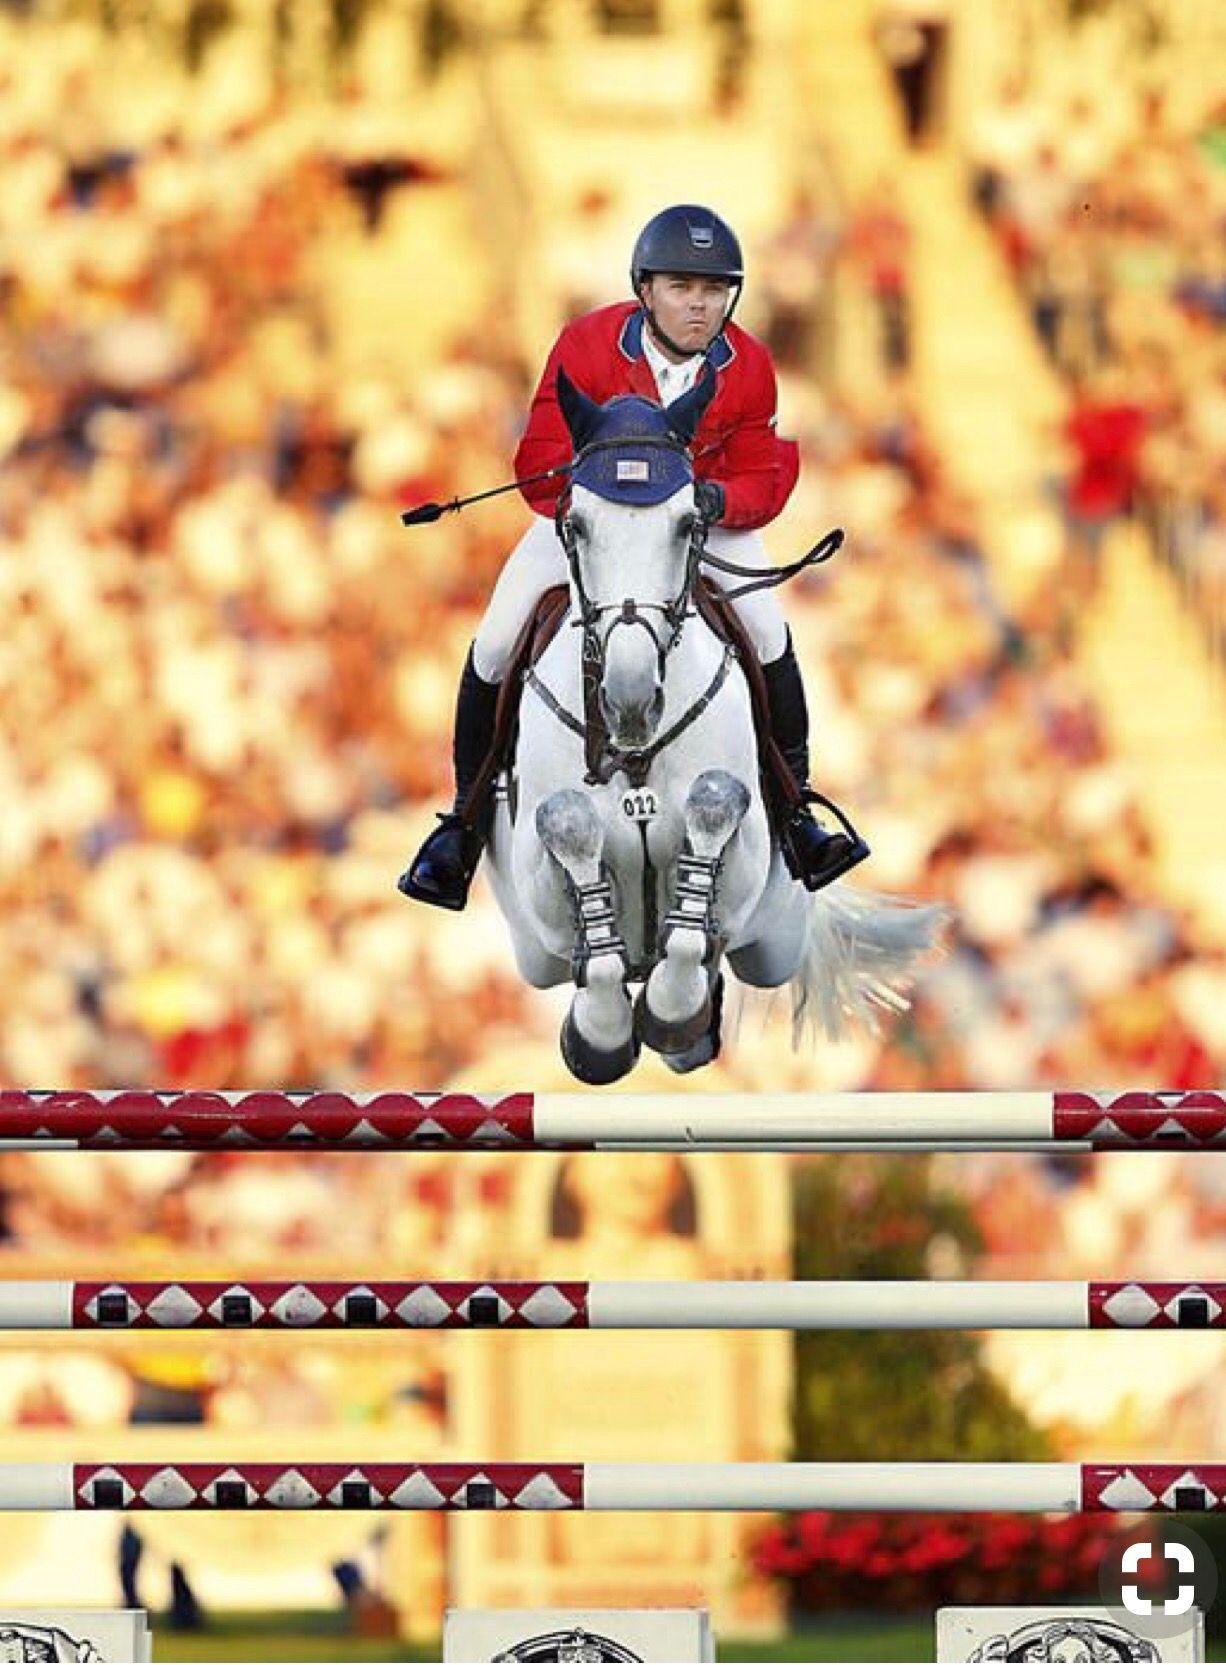 Pin by Maryann Petri on Kent Farrington | Horses, Show